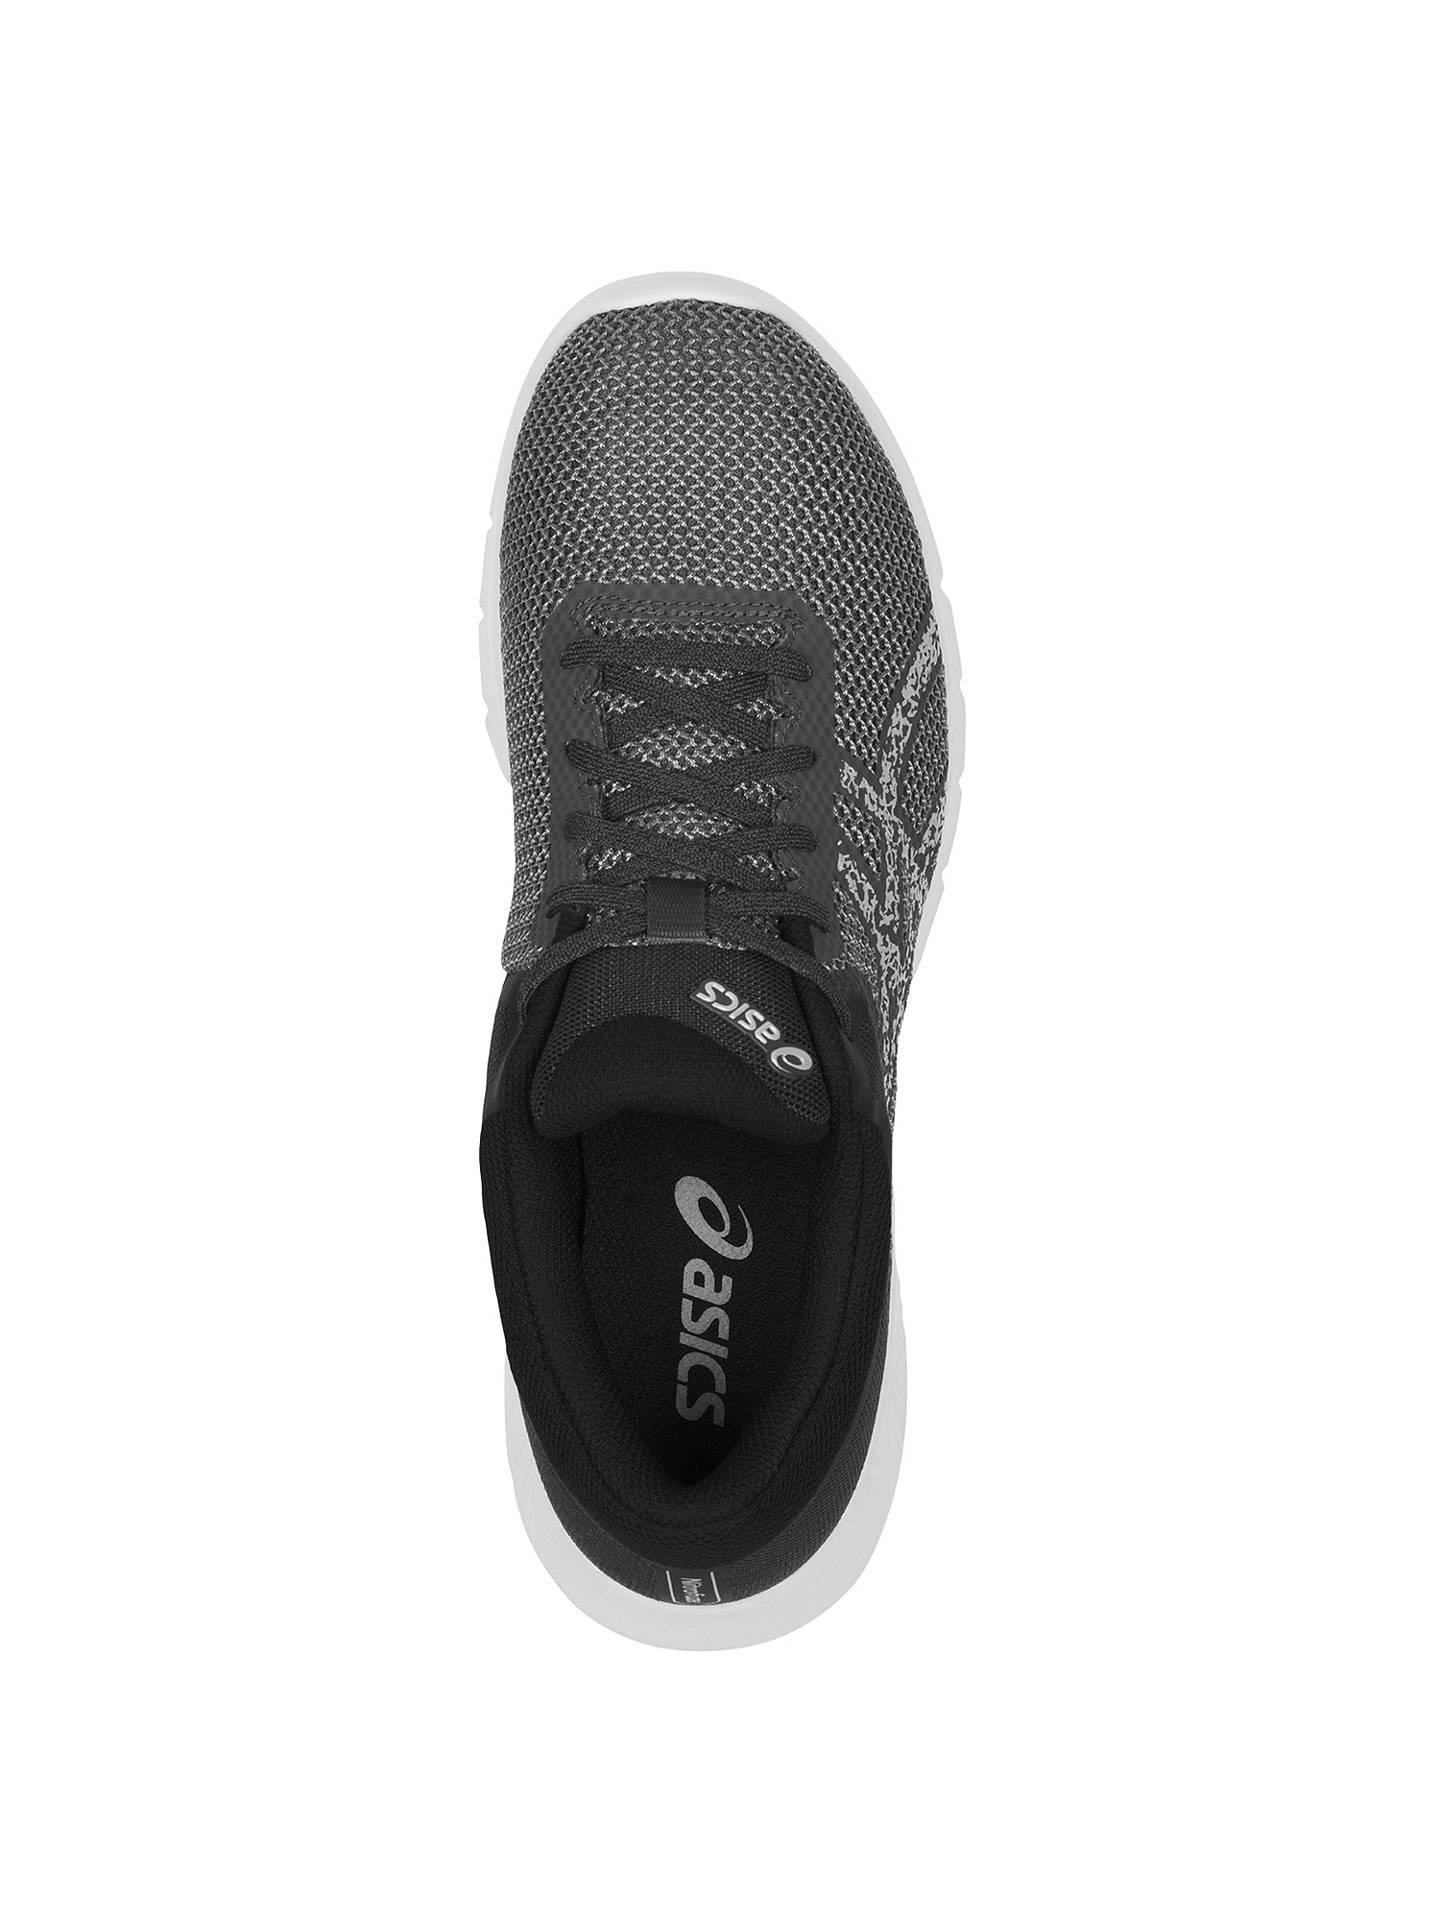 44bbc8104380 Asics NitroFuze 2 Men s Running Shoes at John Lewis   Partners